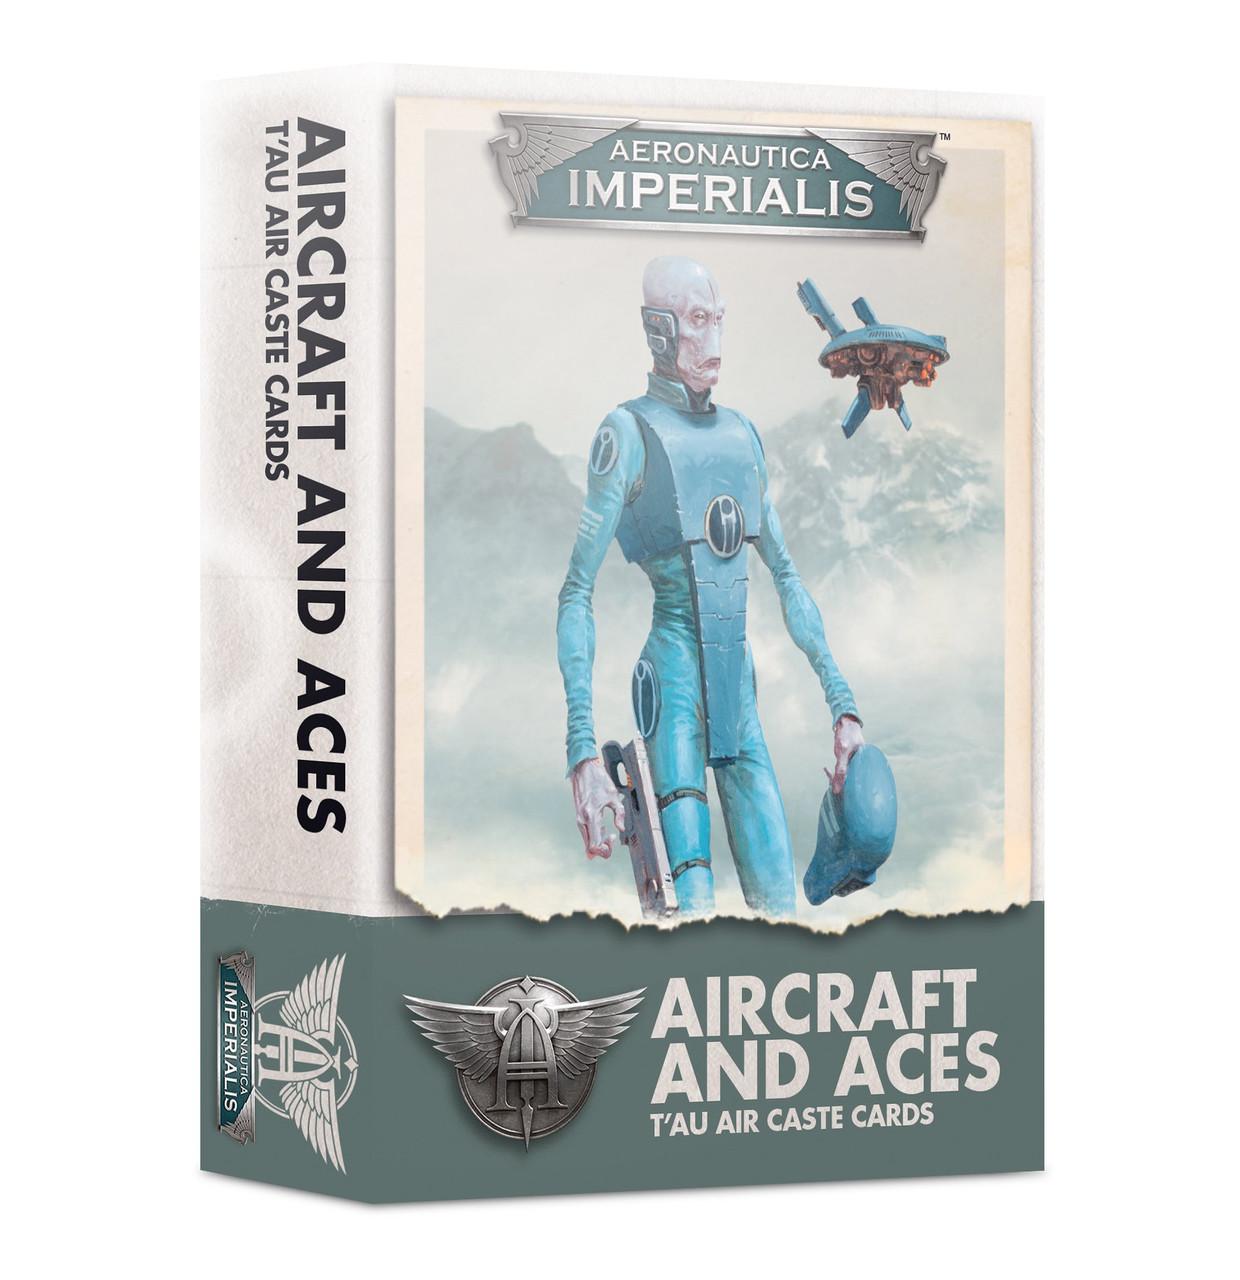 A/I:AIRCRAFT & ACES T'AU AIR CASTE CARDS